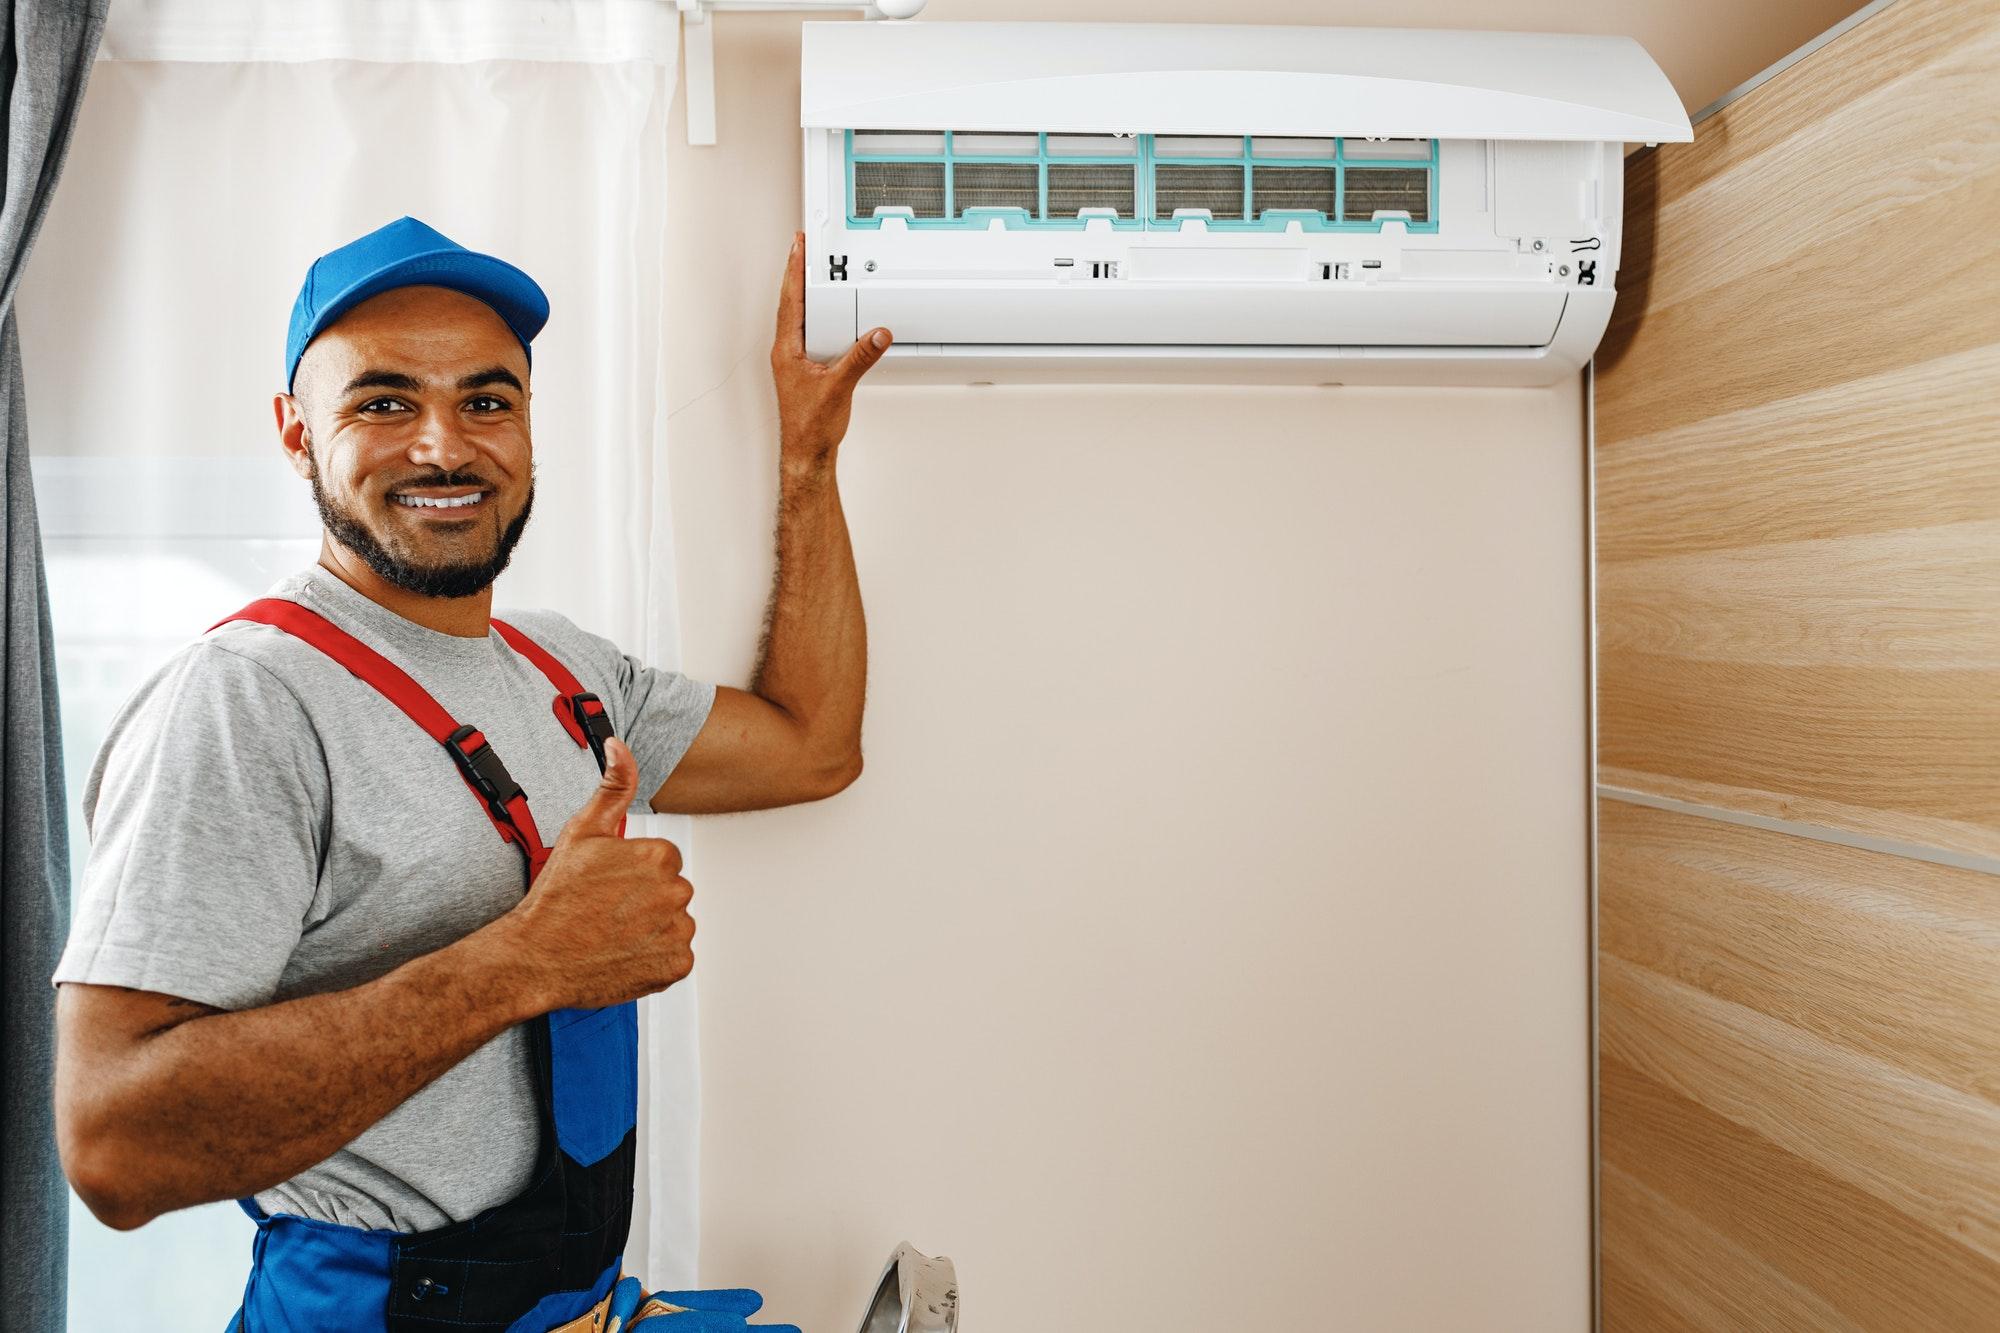 Professional repairman installing air conditioner in a room